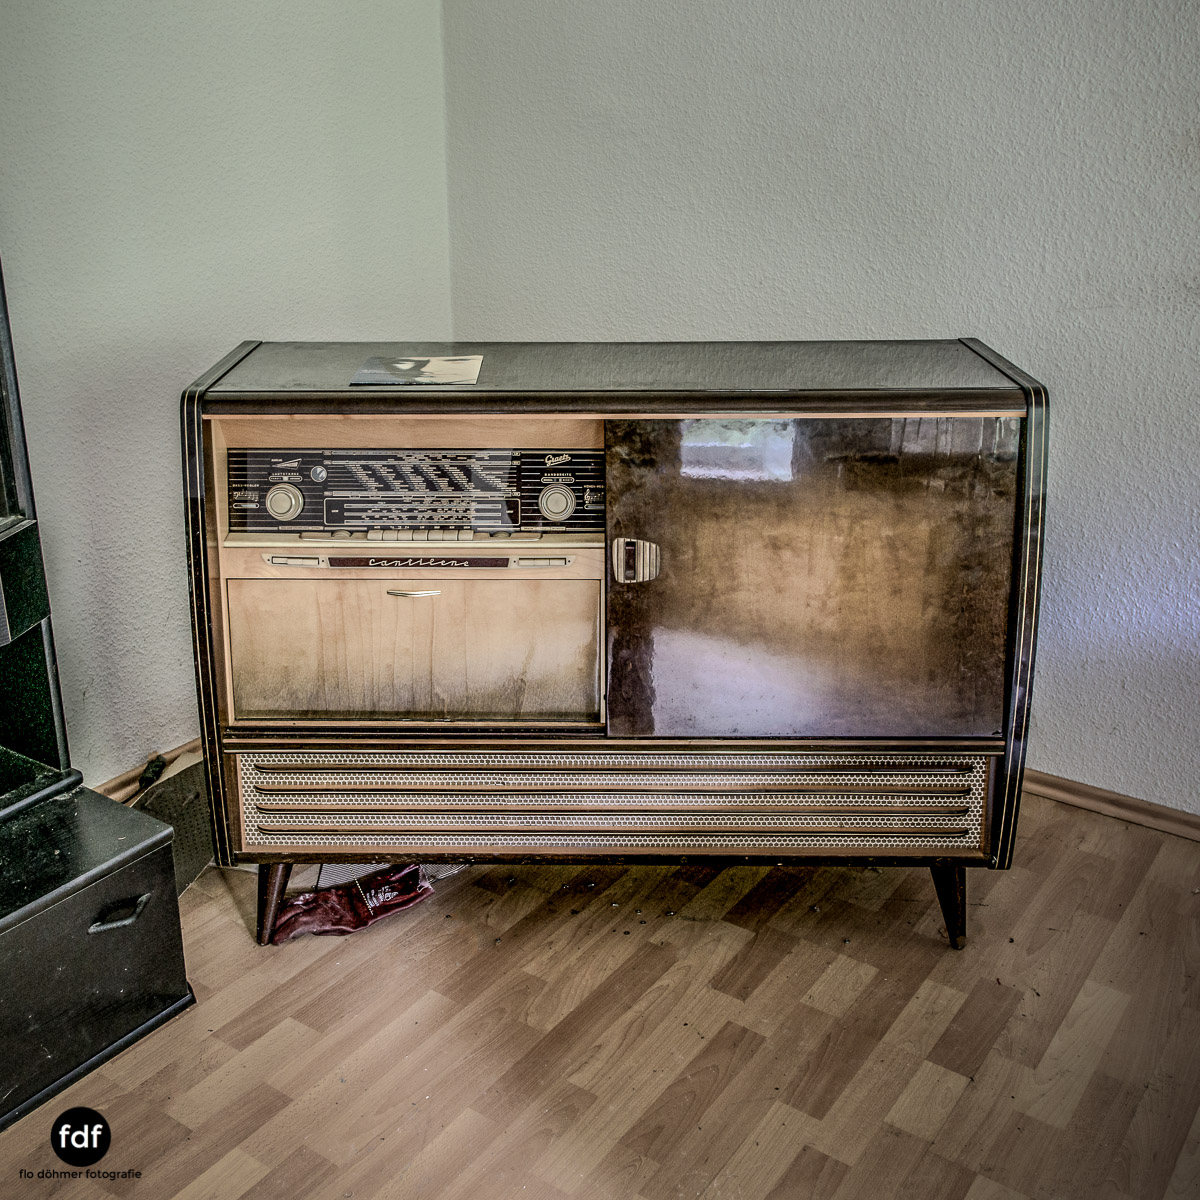 Papierfabrik-2-Kraftwerk-Urbex-Lost-Place-NRW-30.jpg